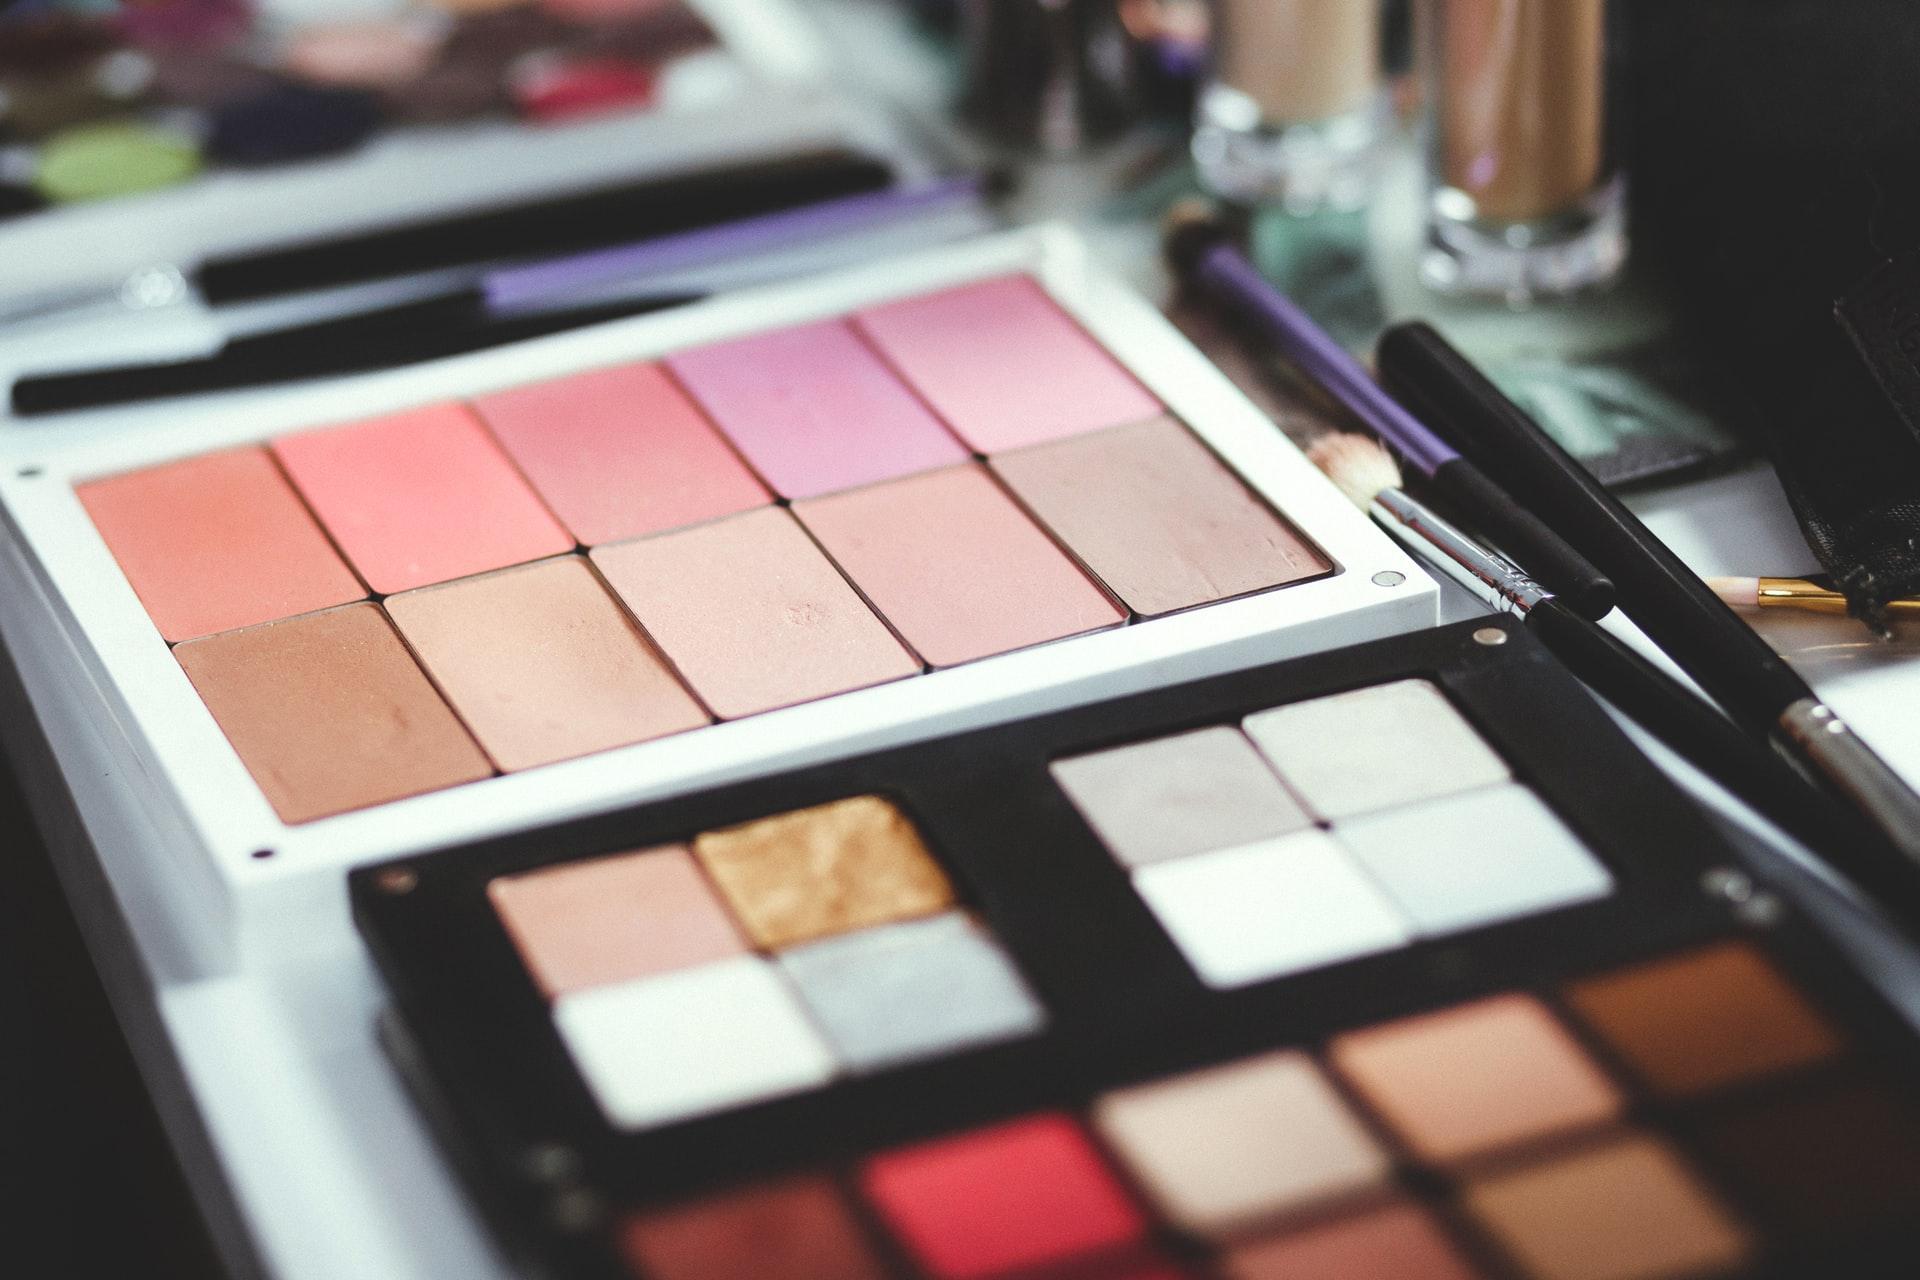 Sector cosmetico